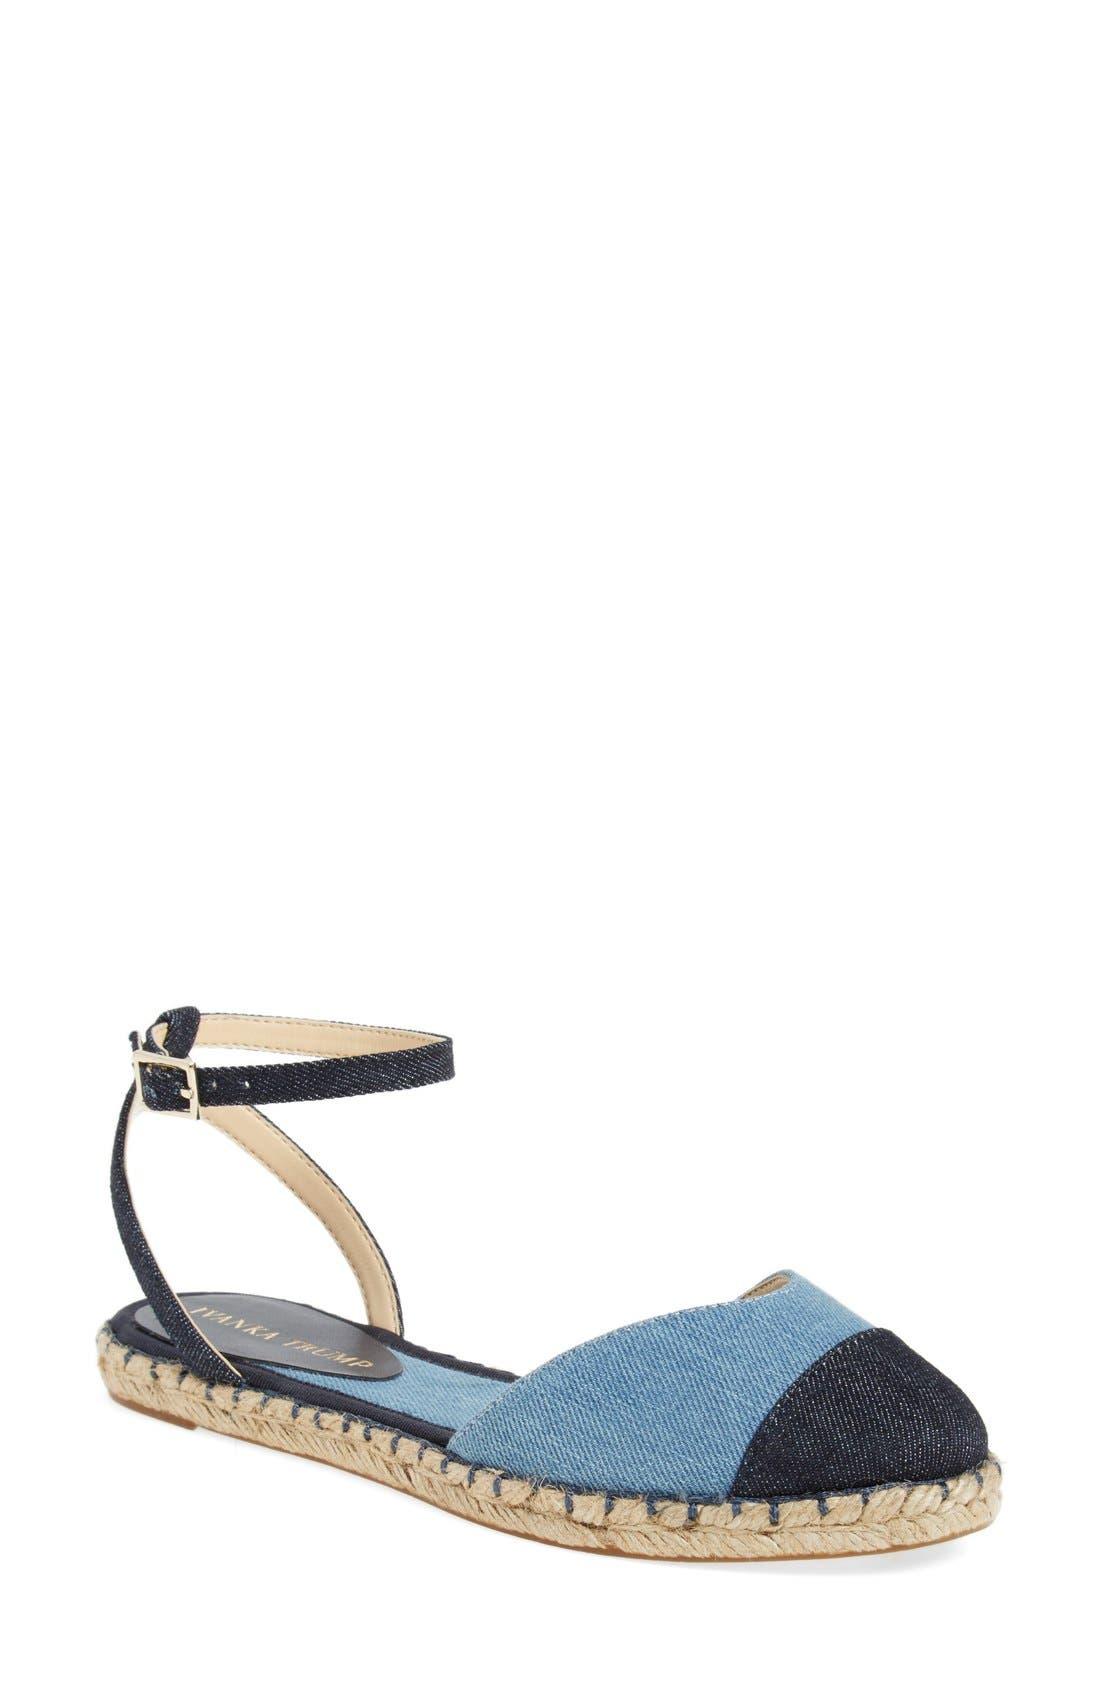 Alternate Image 1 Selected - Ivanka Trump 'Rion' Ankle Strap Espadrille Flat (Women)